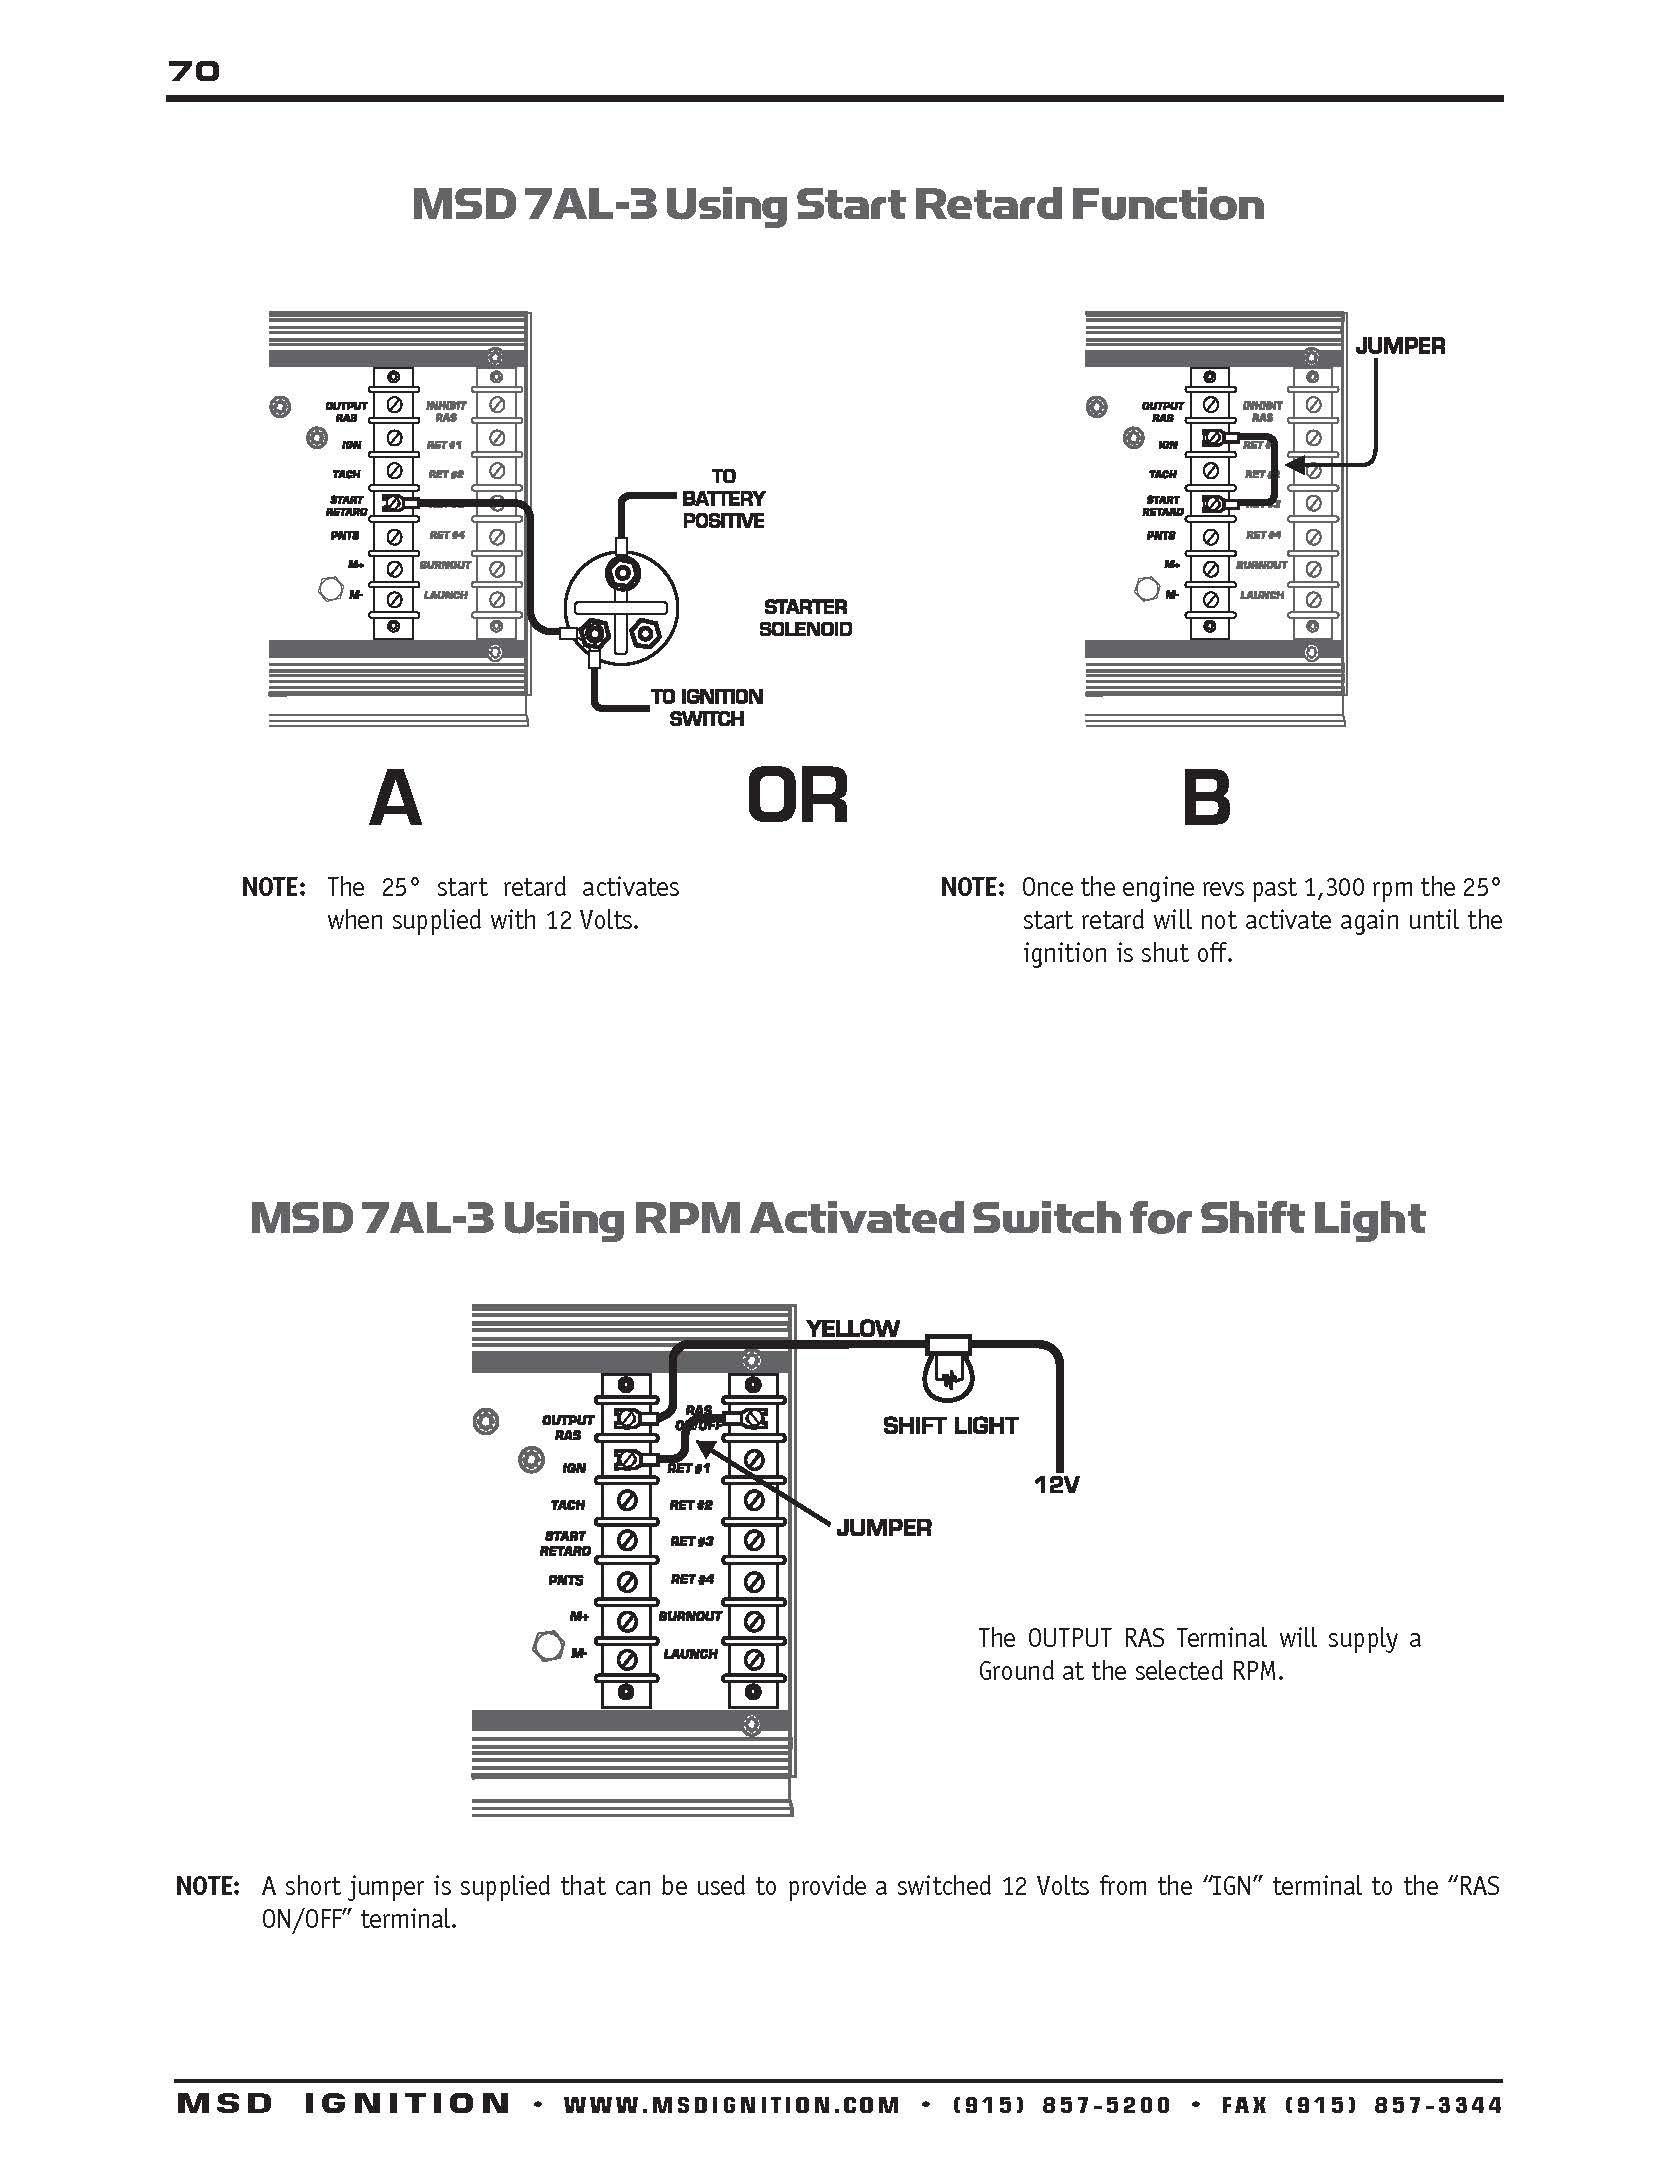 Inspirational Msd 7al3 Wiring Diagram | Wiring Diagram Image